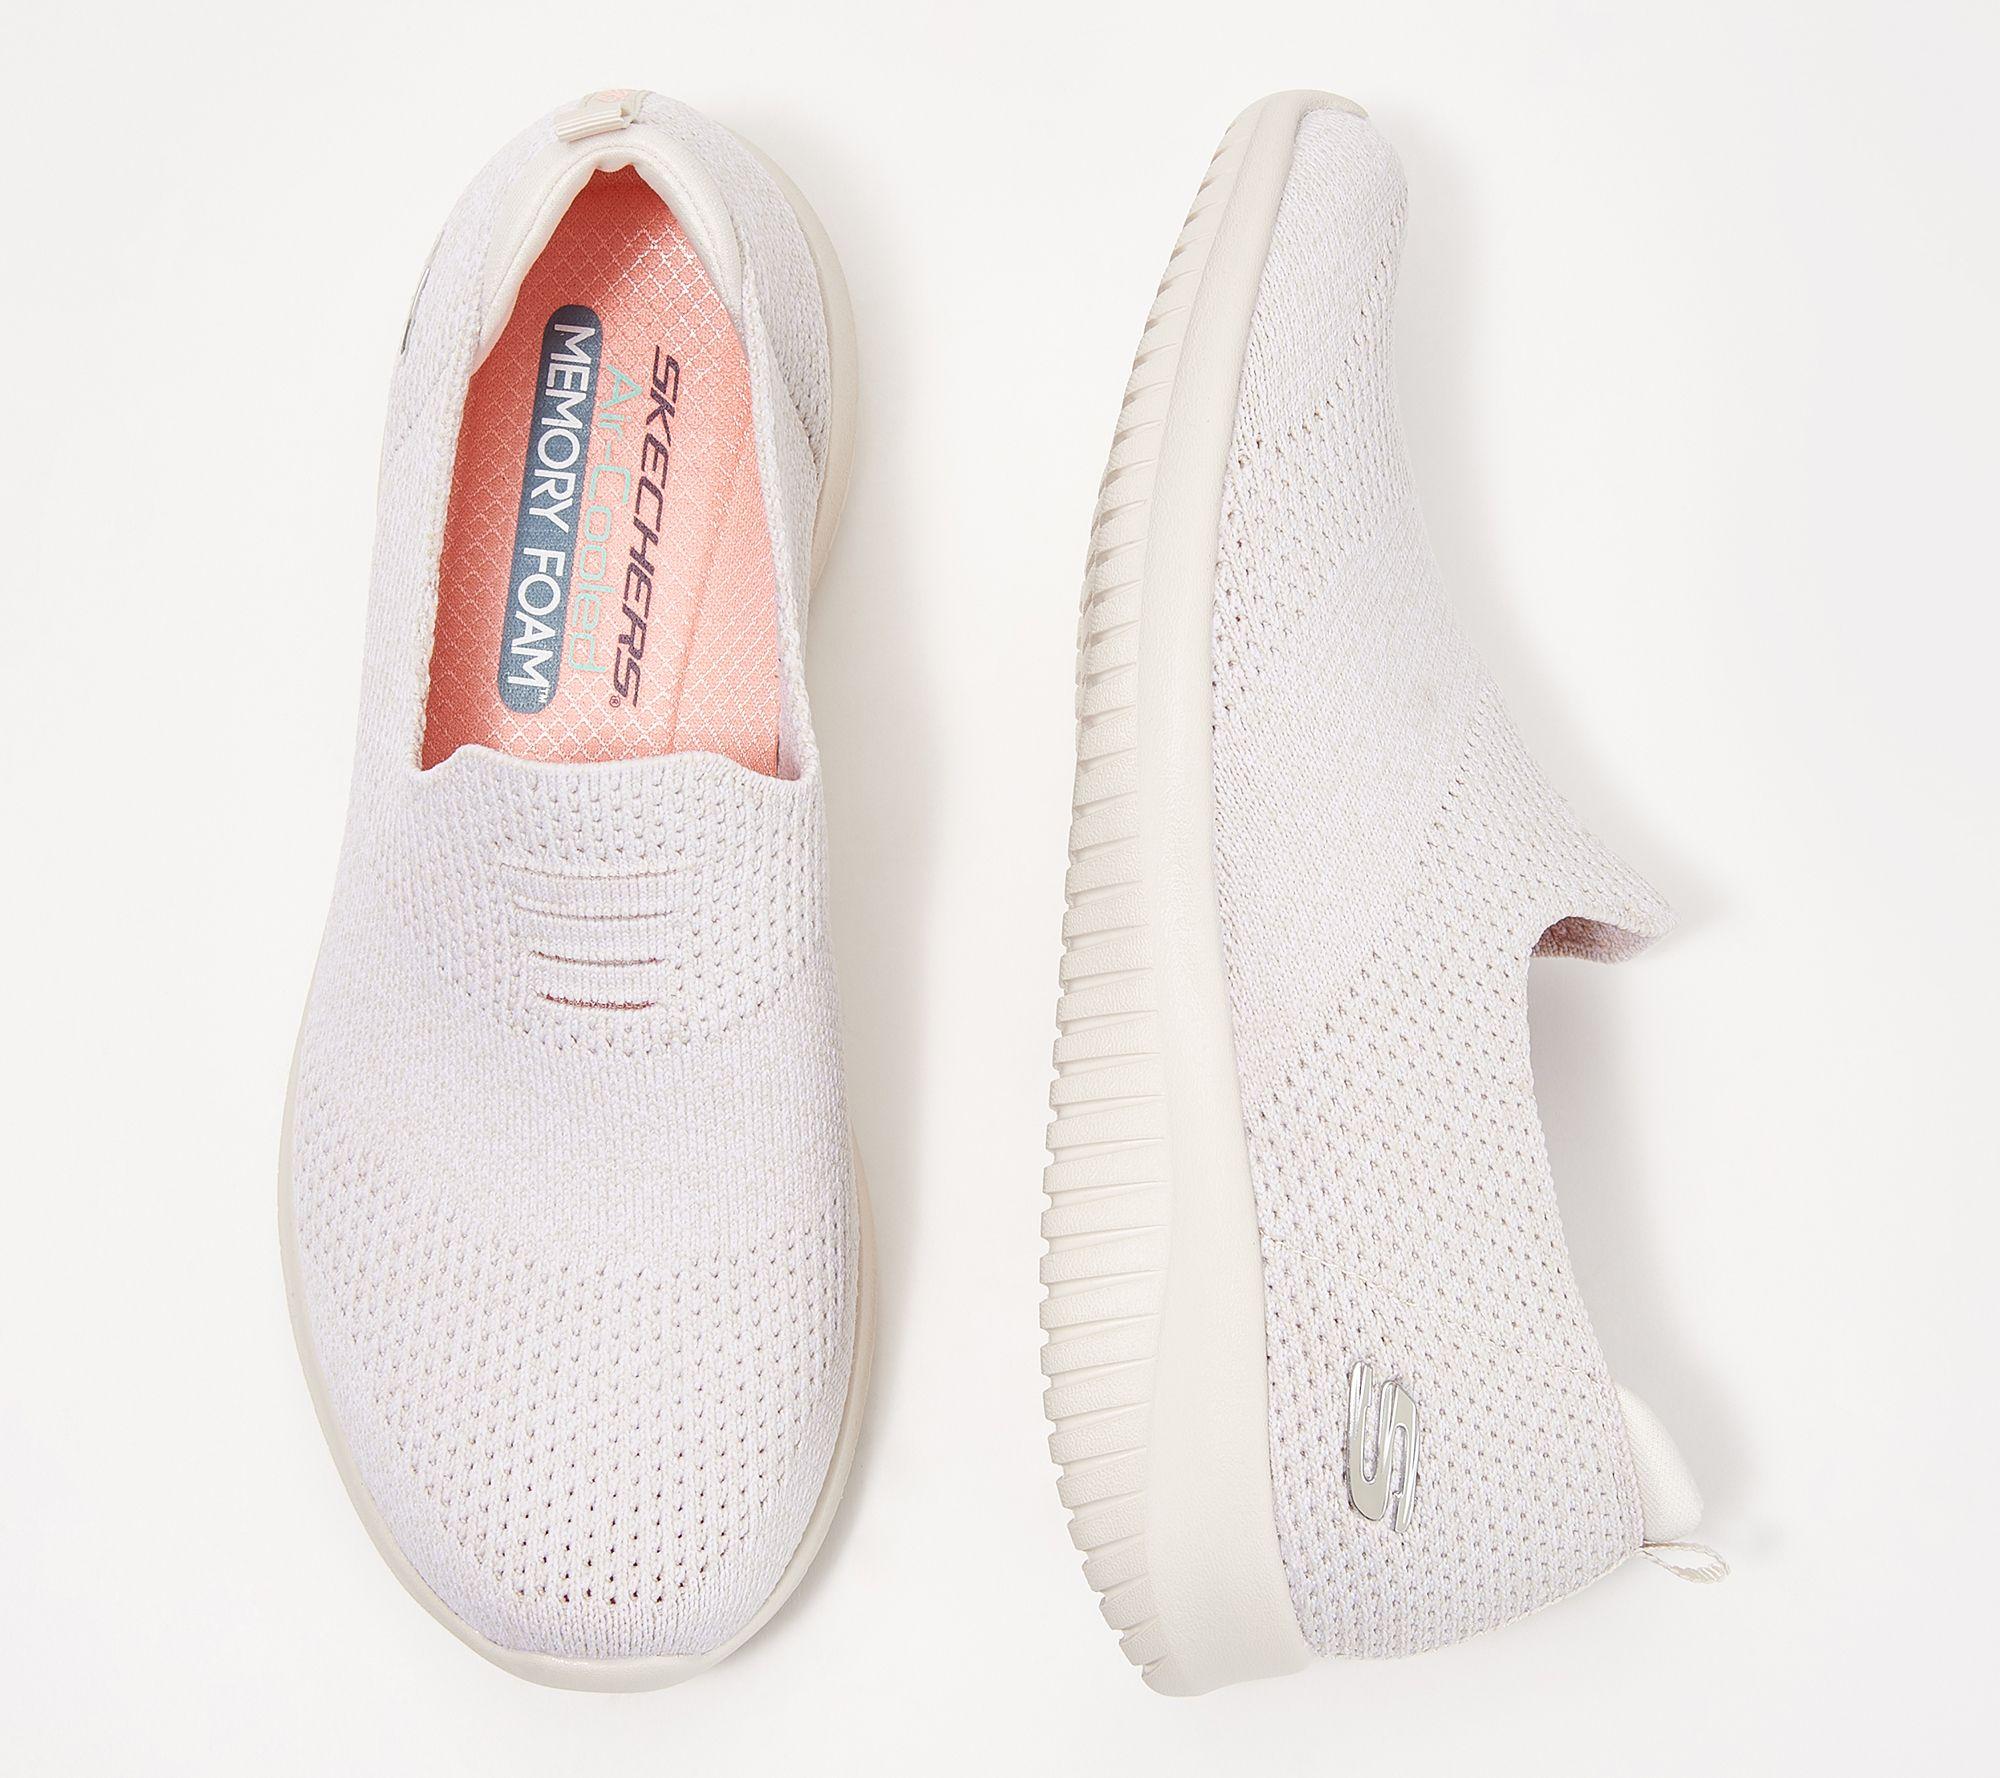 11a94b7651 Skechers Ultra Flex Flat Knit Slip-On Shoes - Harmonious — QVC.com